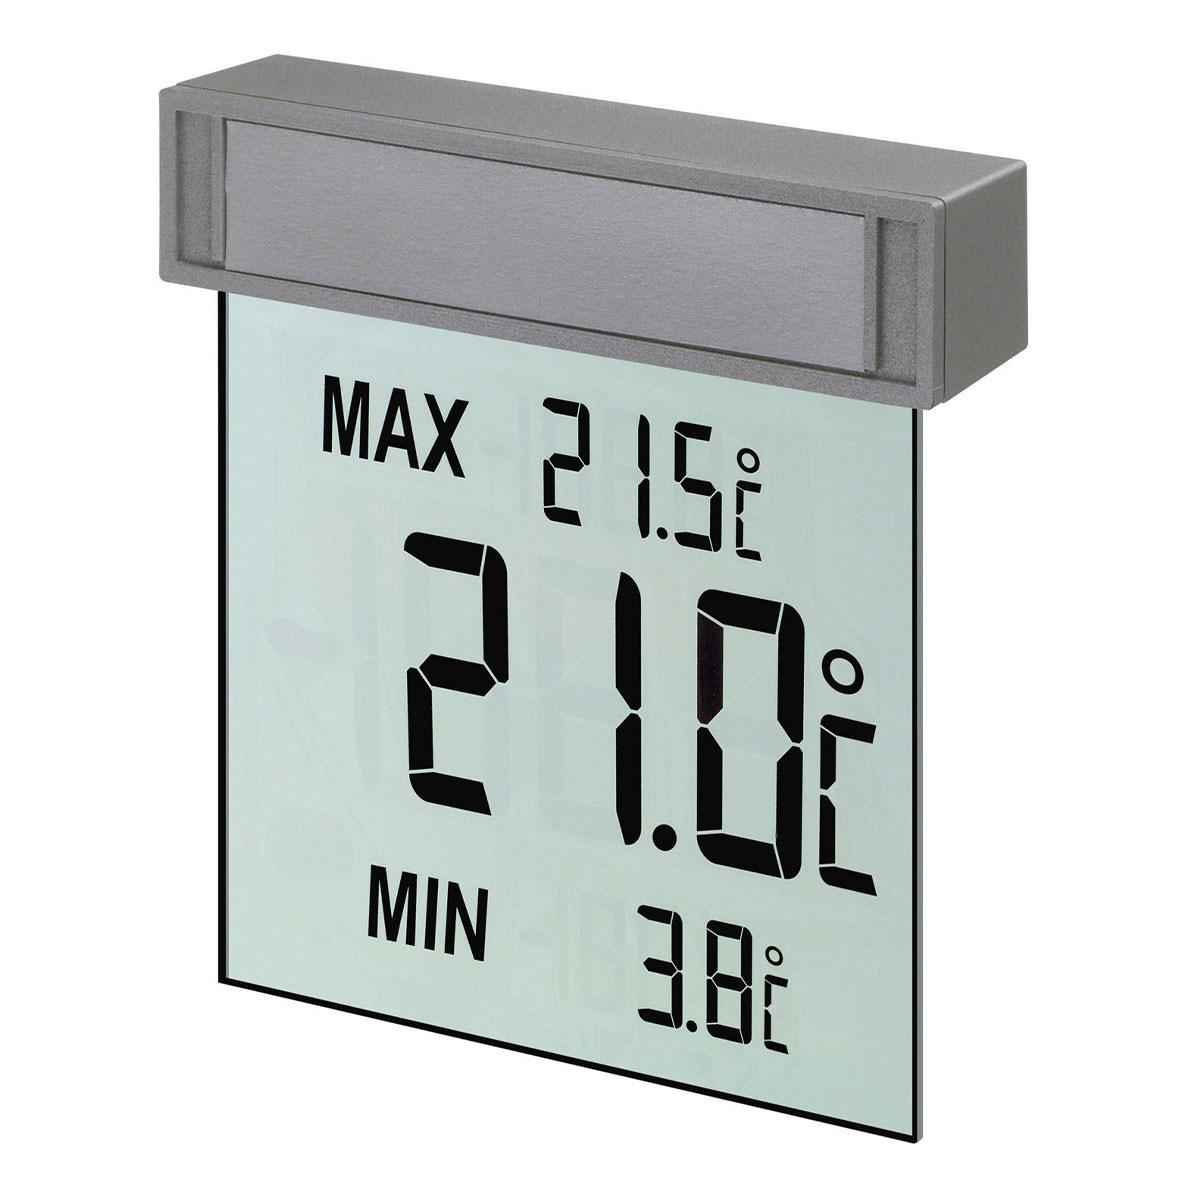 30-1025-digitales-fensterthermometer-vision-1200x1200px.jpg